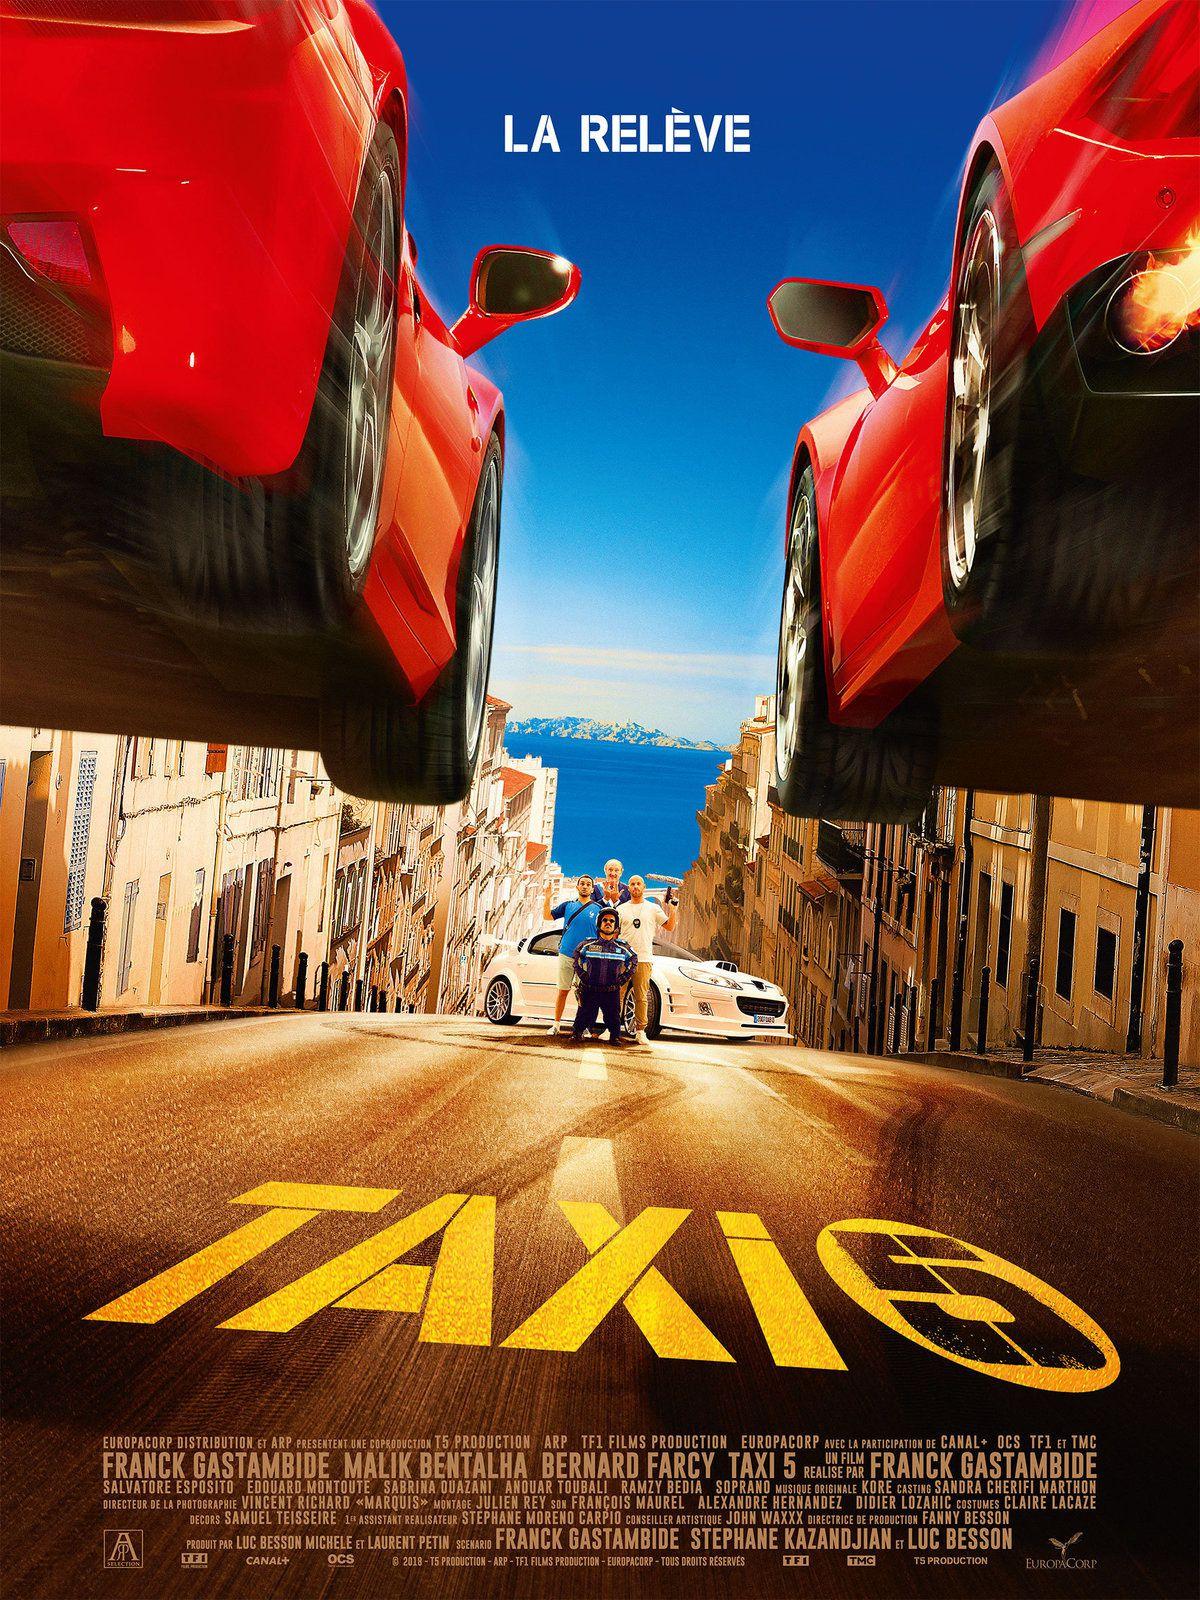 Sortie nationale ce mercredi du film Taxi 5.